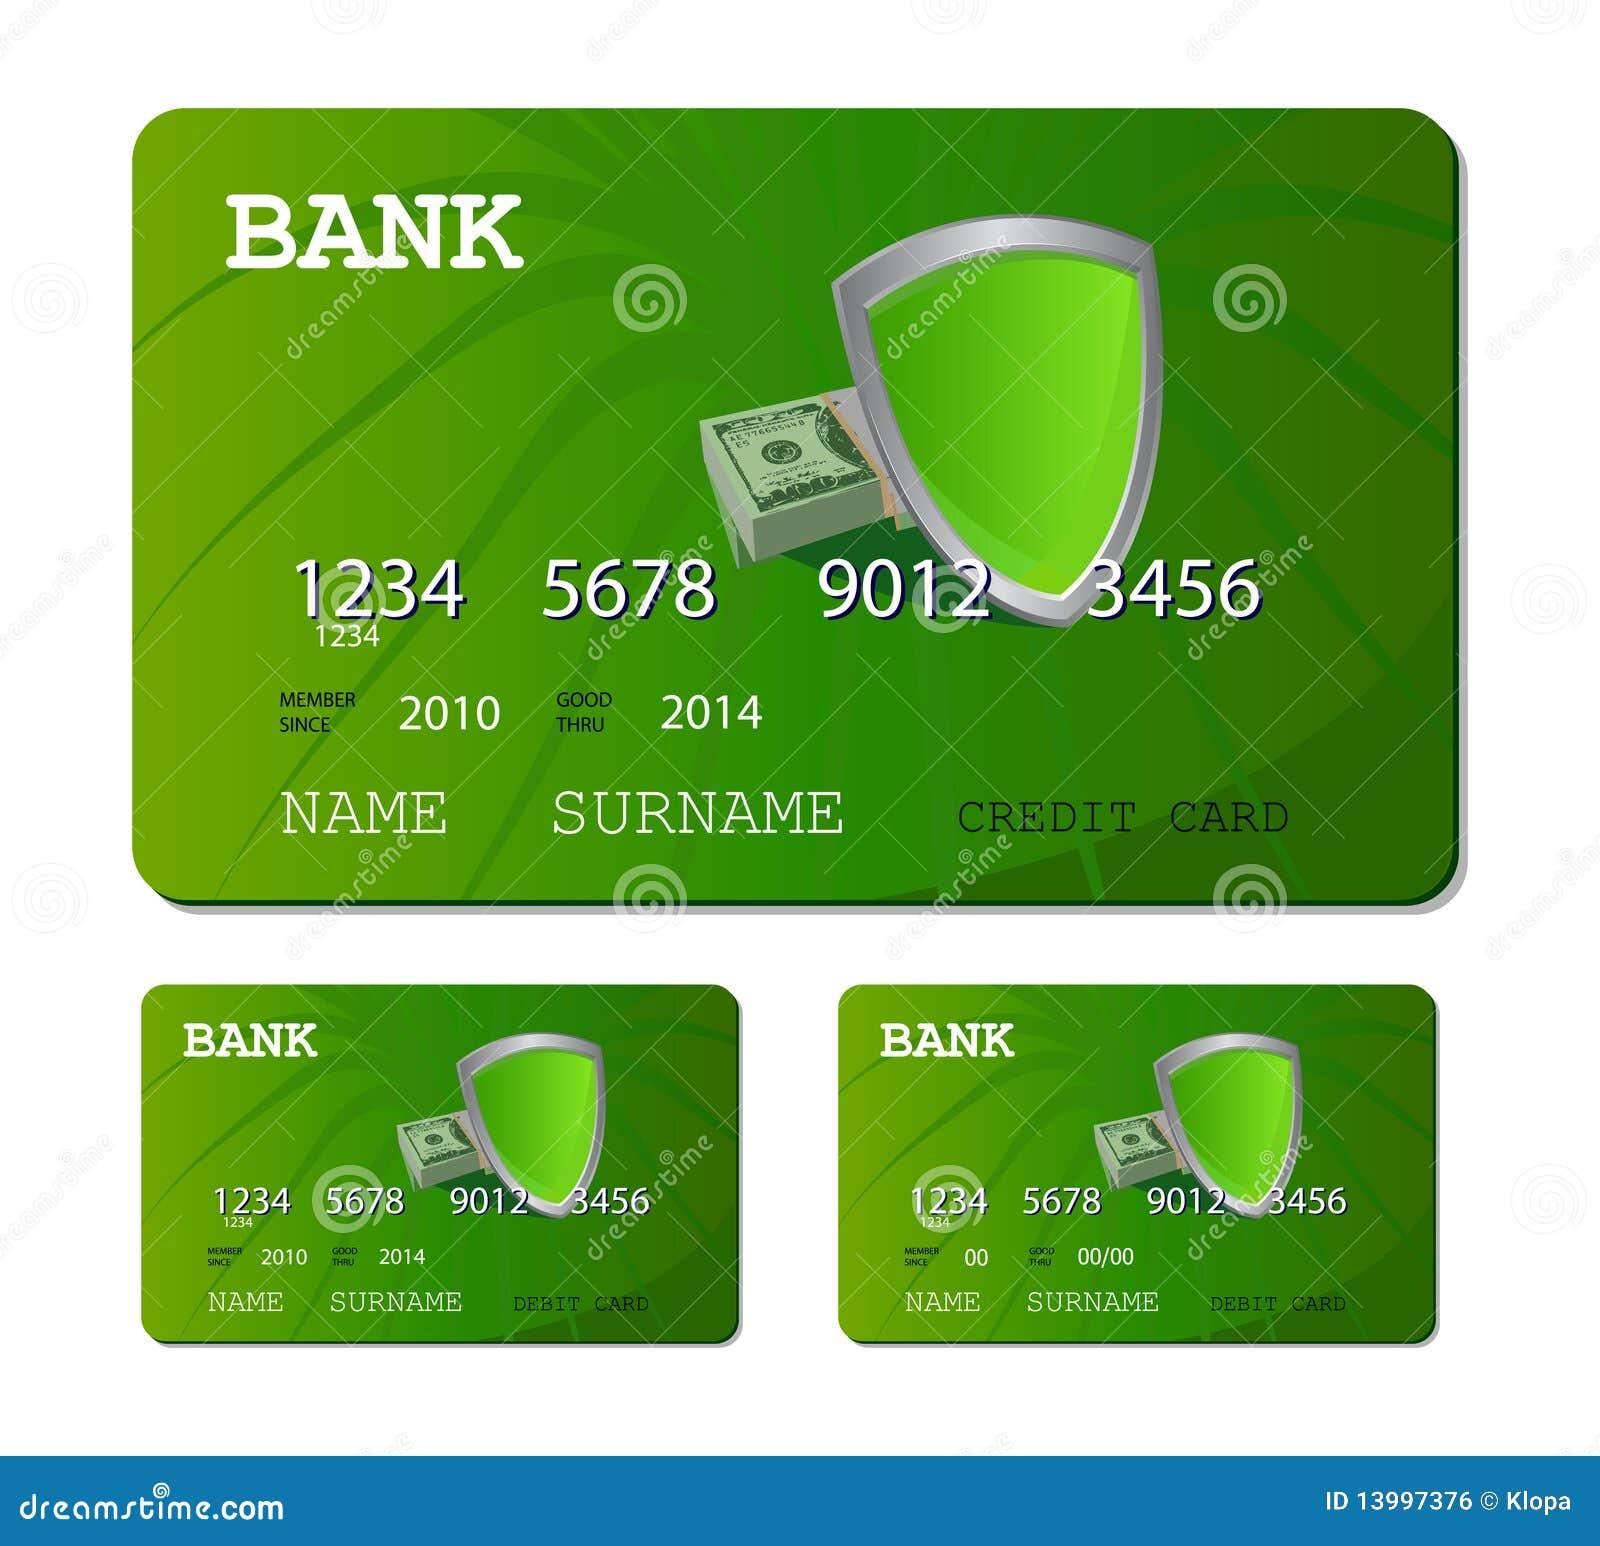 credit or debit green card royalty free stock image image 13997376. Black Bedroom Furniture Sets. Home Design Ideas